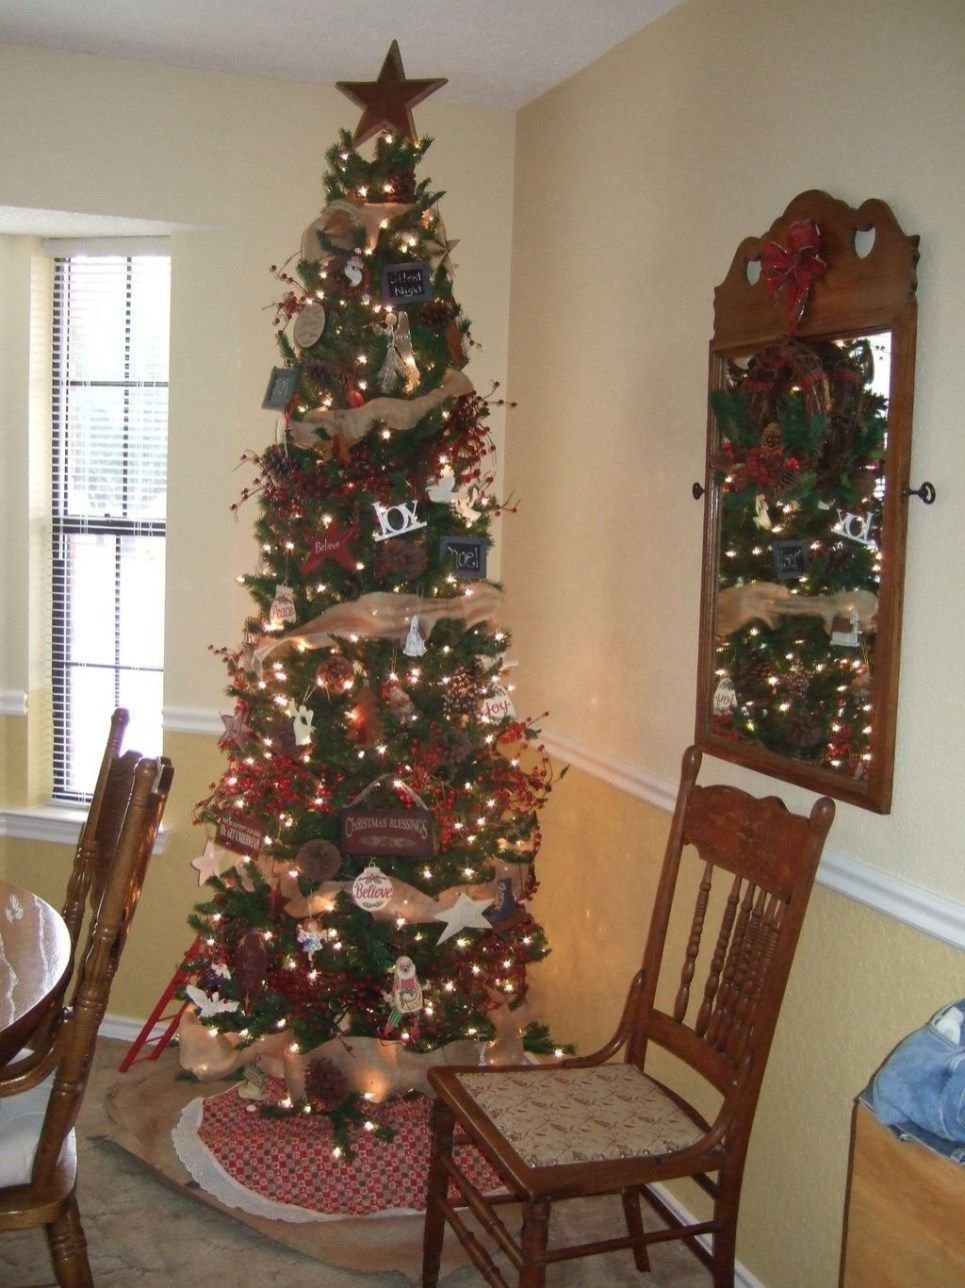 20+ Awesome Pencil Christmas Tree Ideas #smallchristmastreeideas Awesome Pencil Christmas Tree Ideas 32 #smallchristmastreeideas